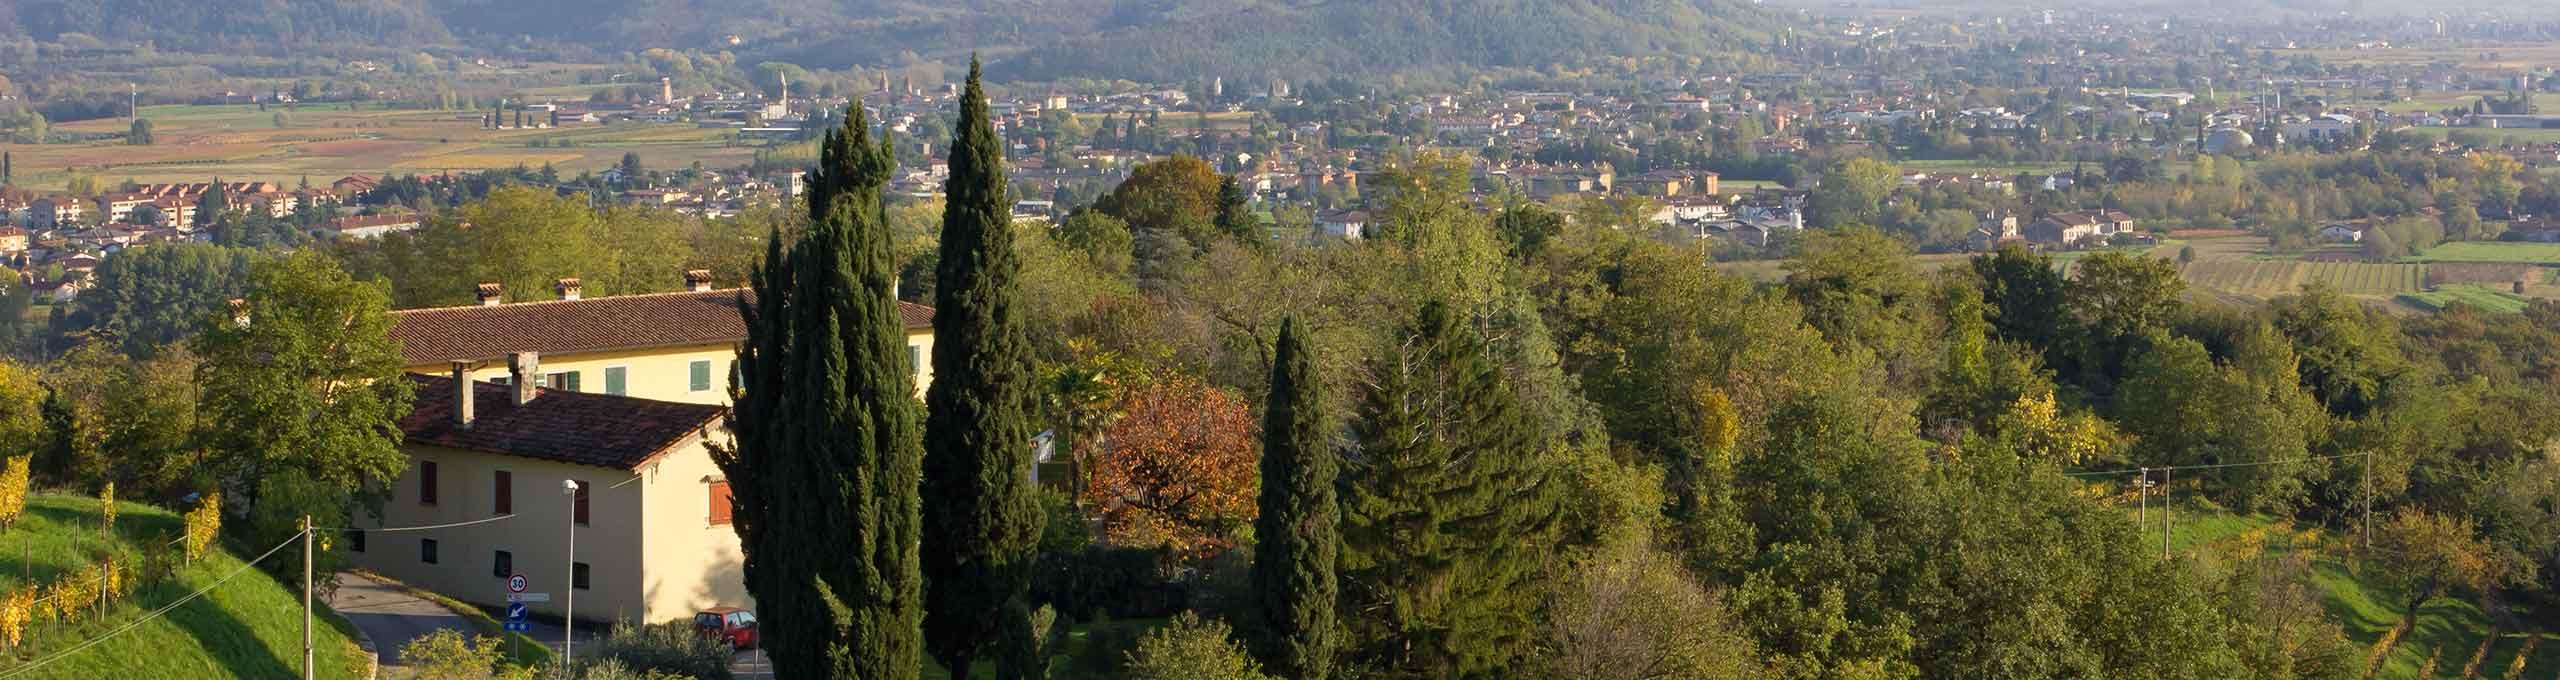 Manzano, Cividale e Valli Natisone Torre